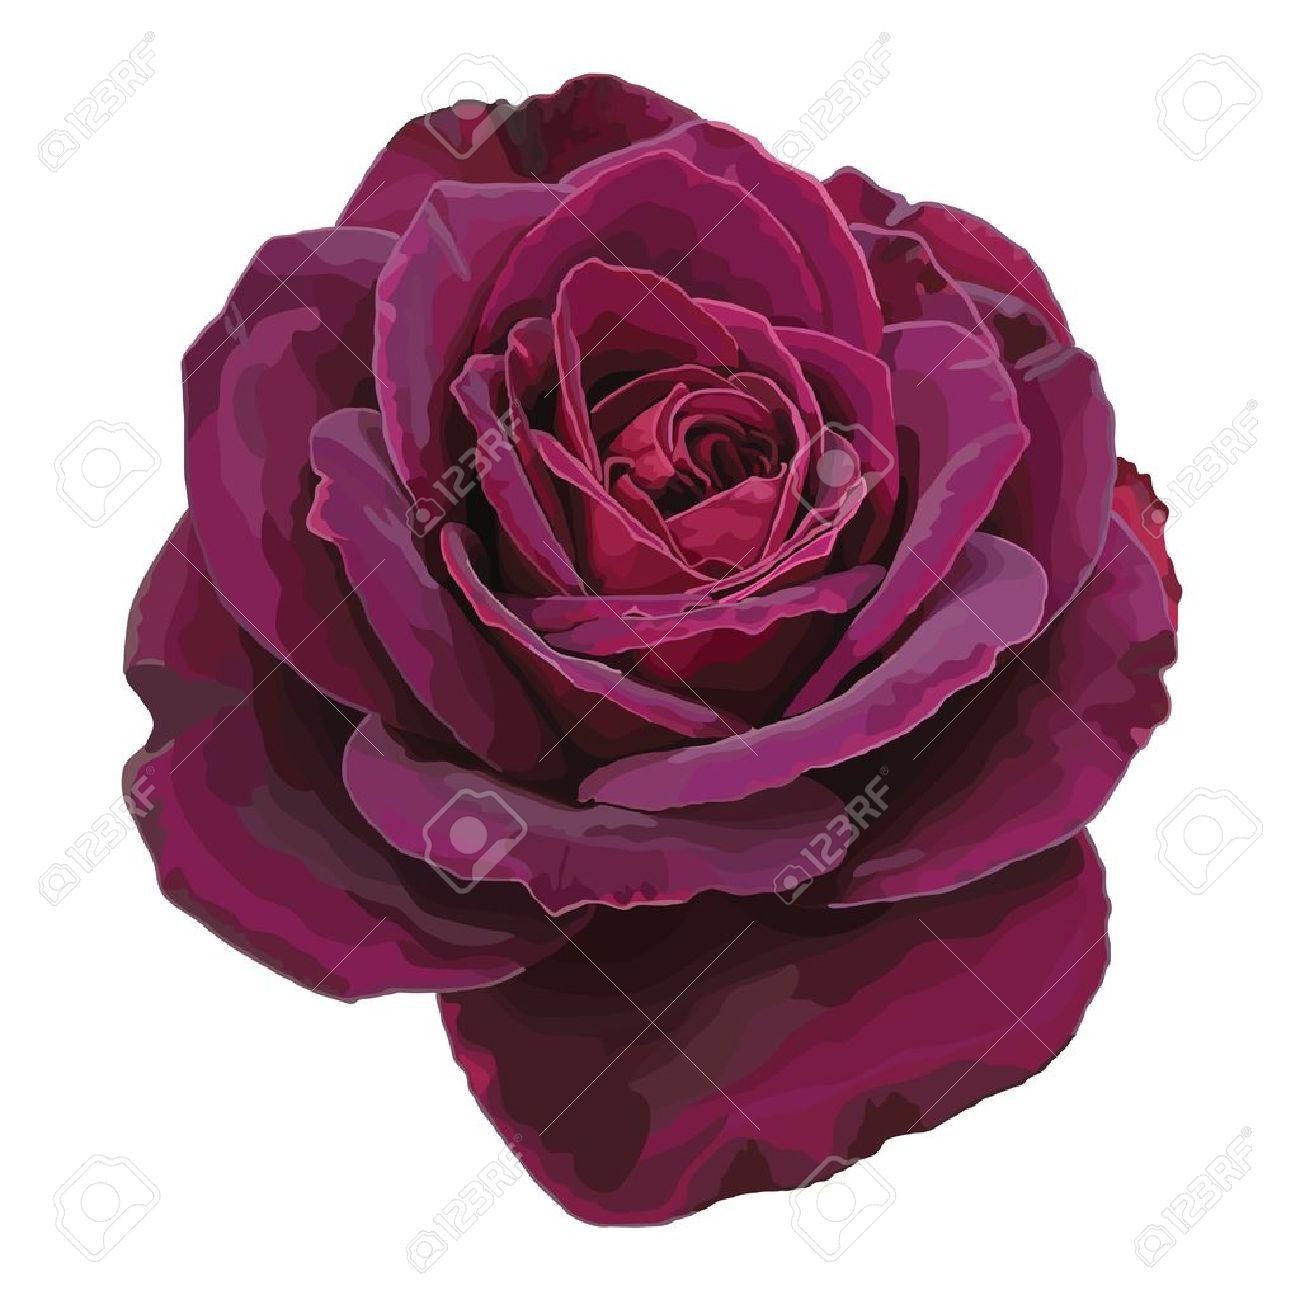 Rose Purple white background exclusive photo